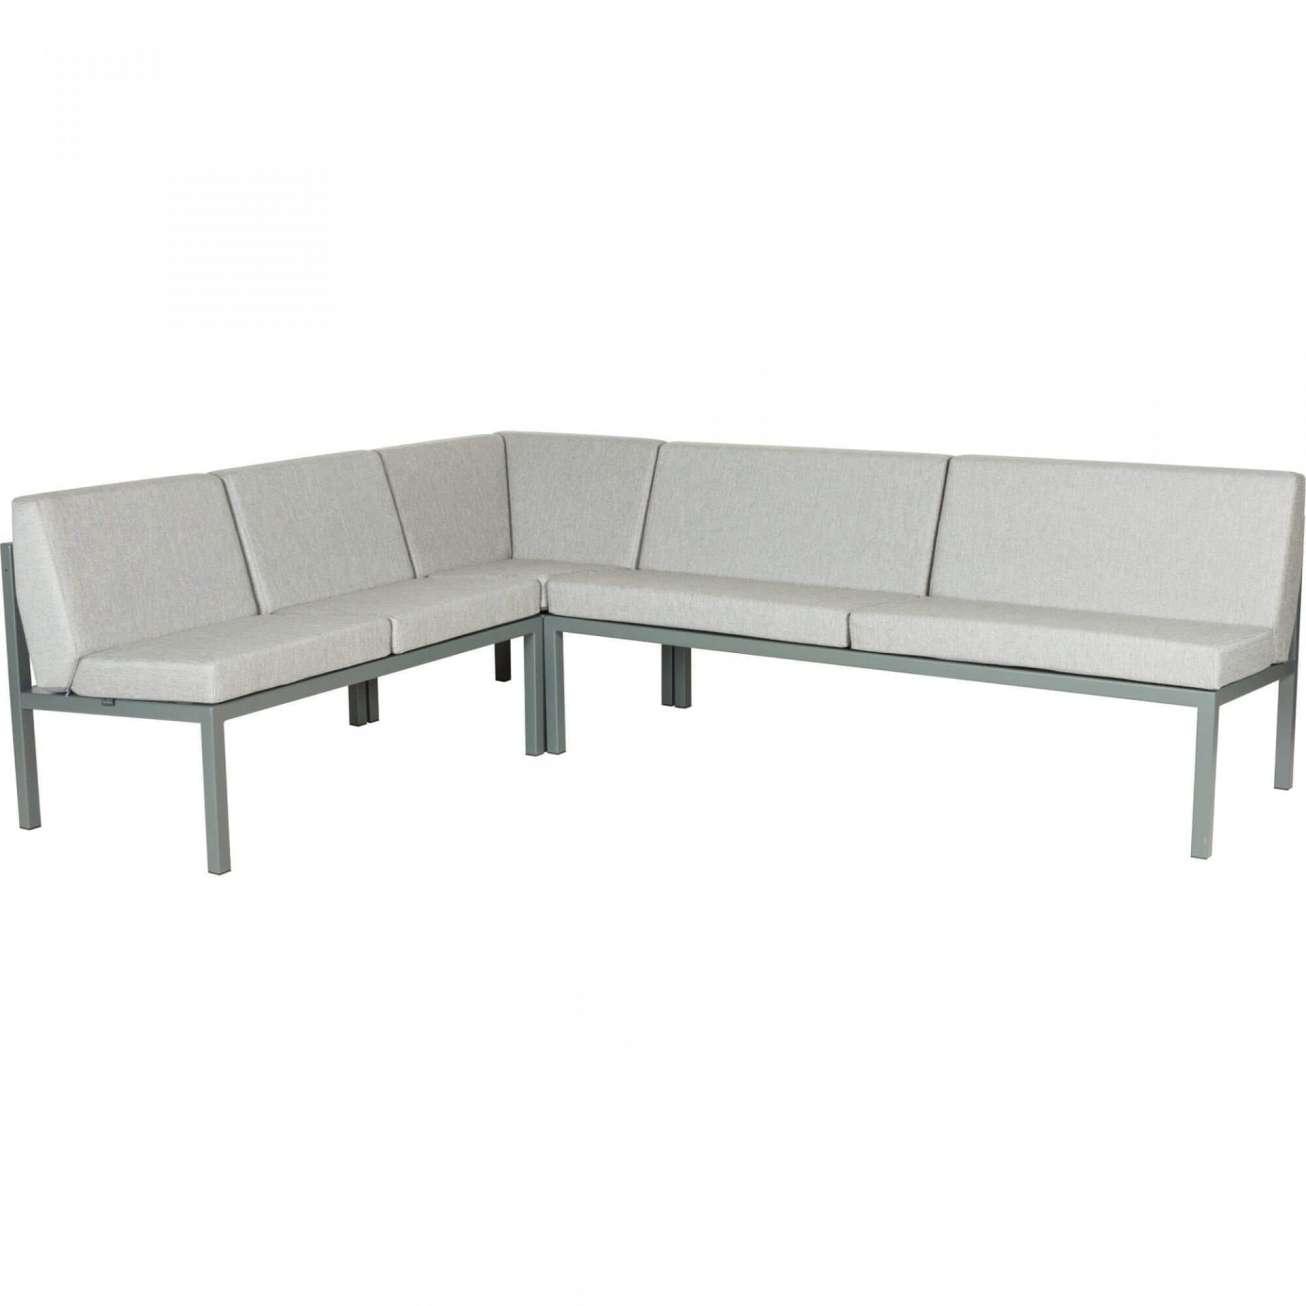 Sundays Frame Multi sofa hjørnegruppe i mørkgrå aluminium med grå puter